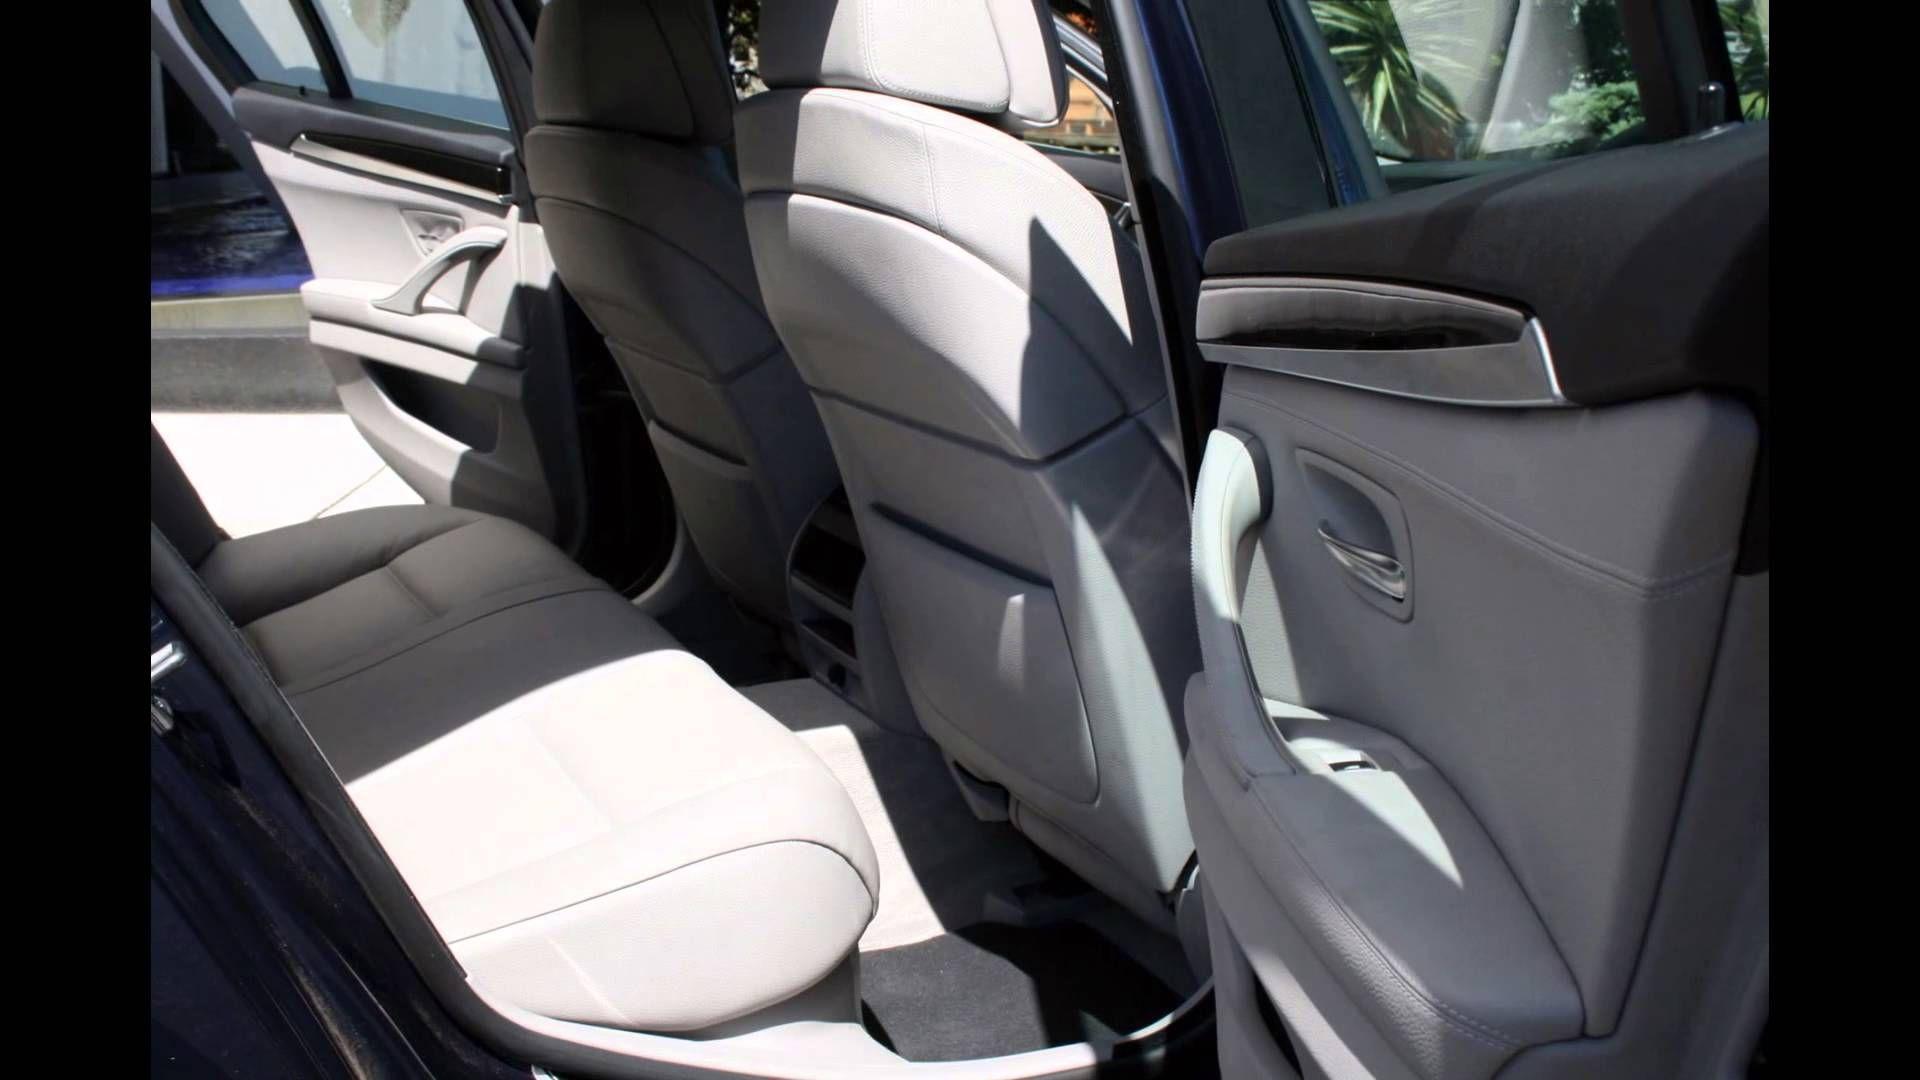 BMW 520D , car dealer Melbourne, Bmw 520d, Car, Car dealer